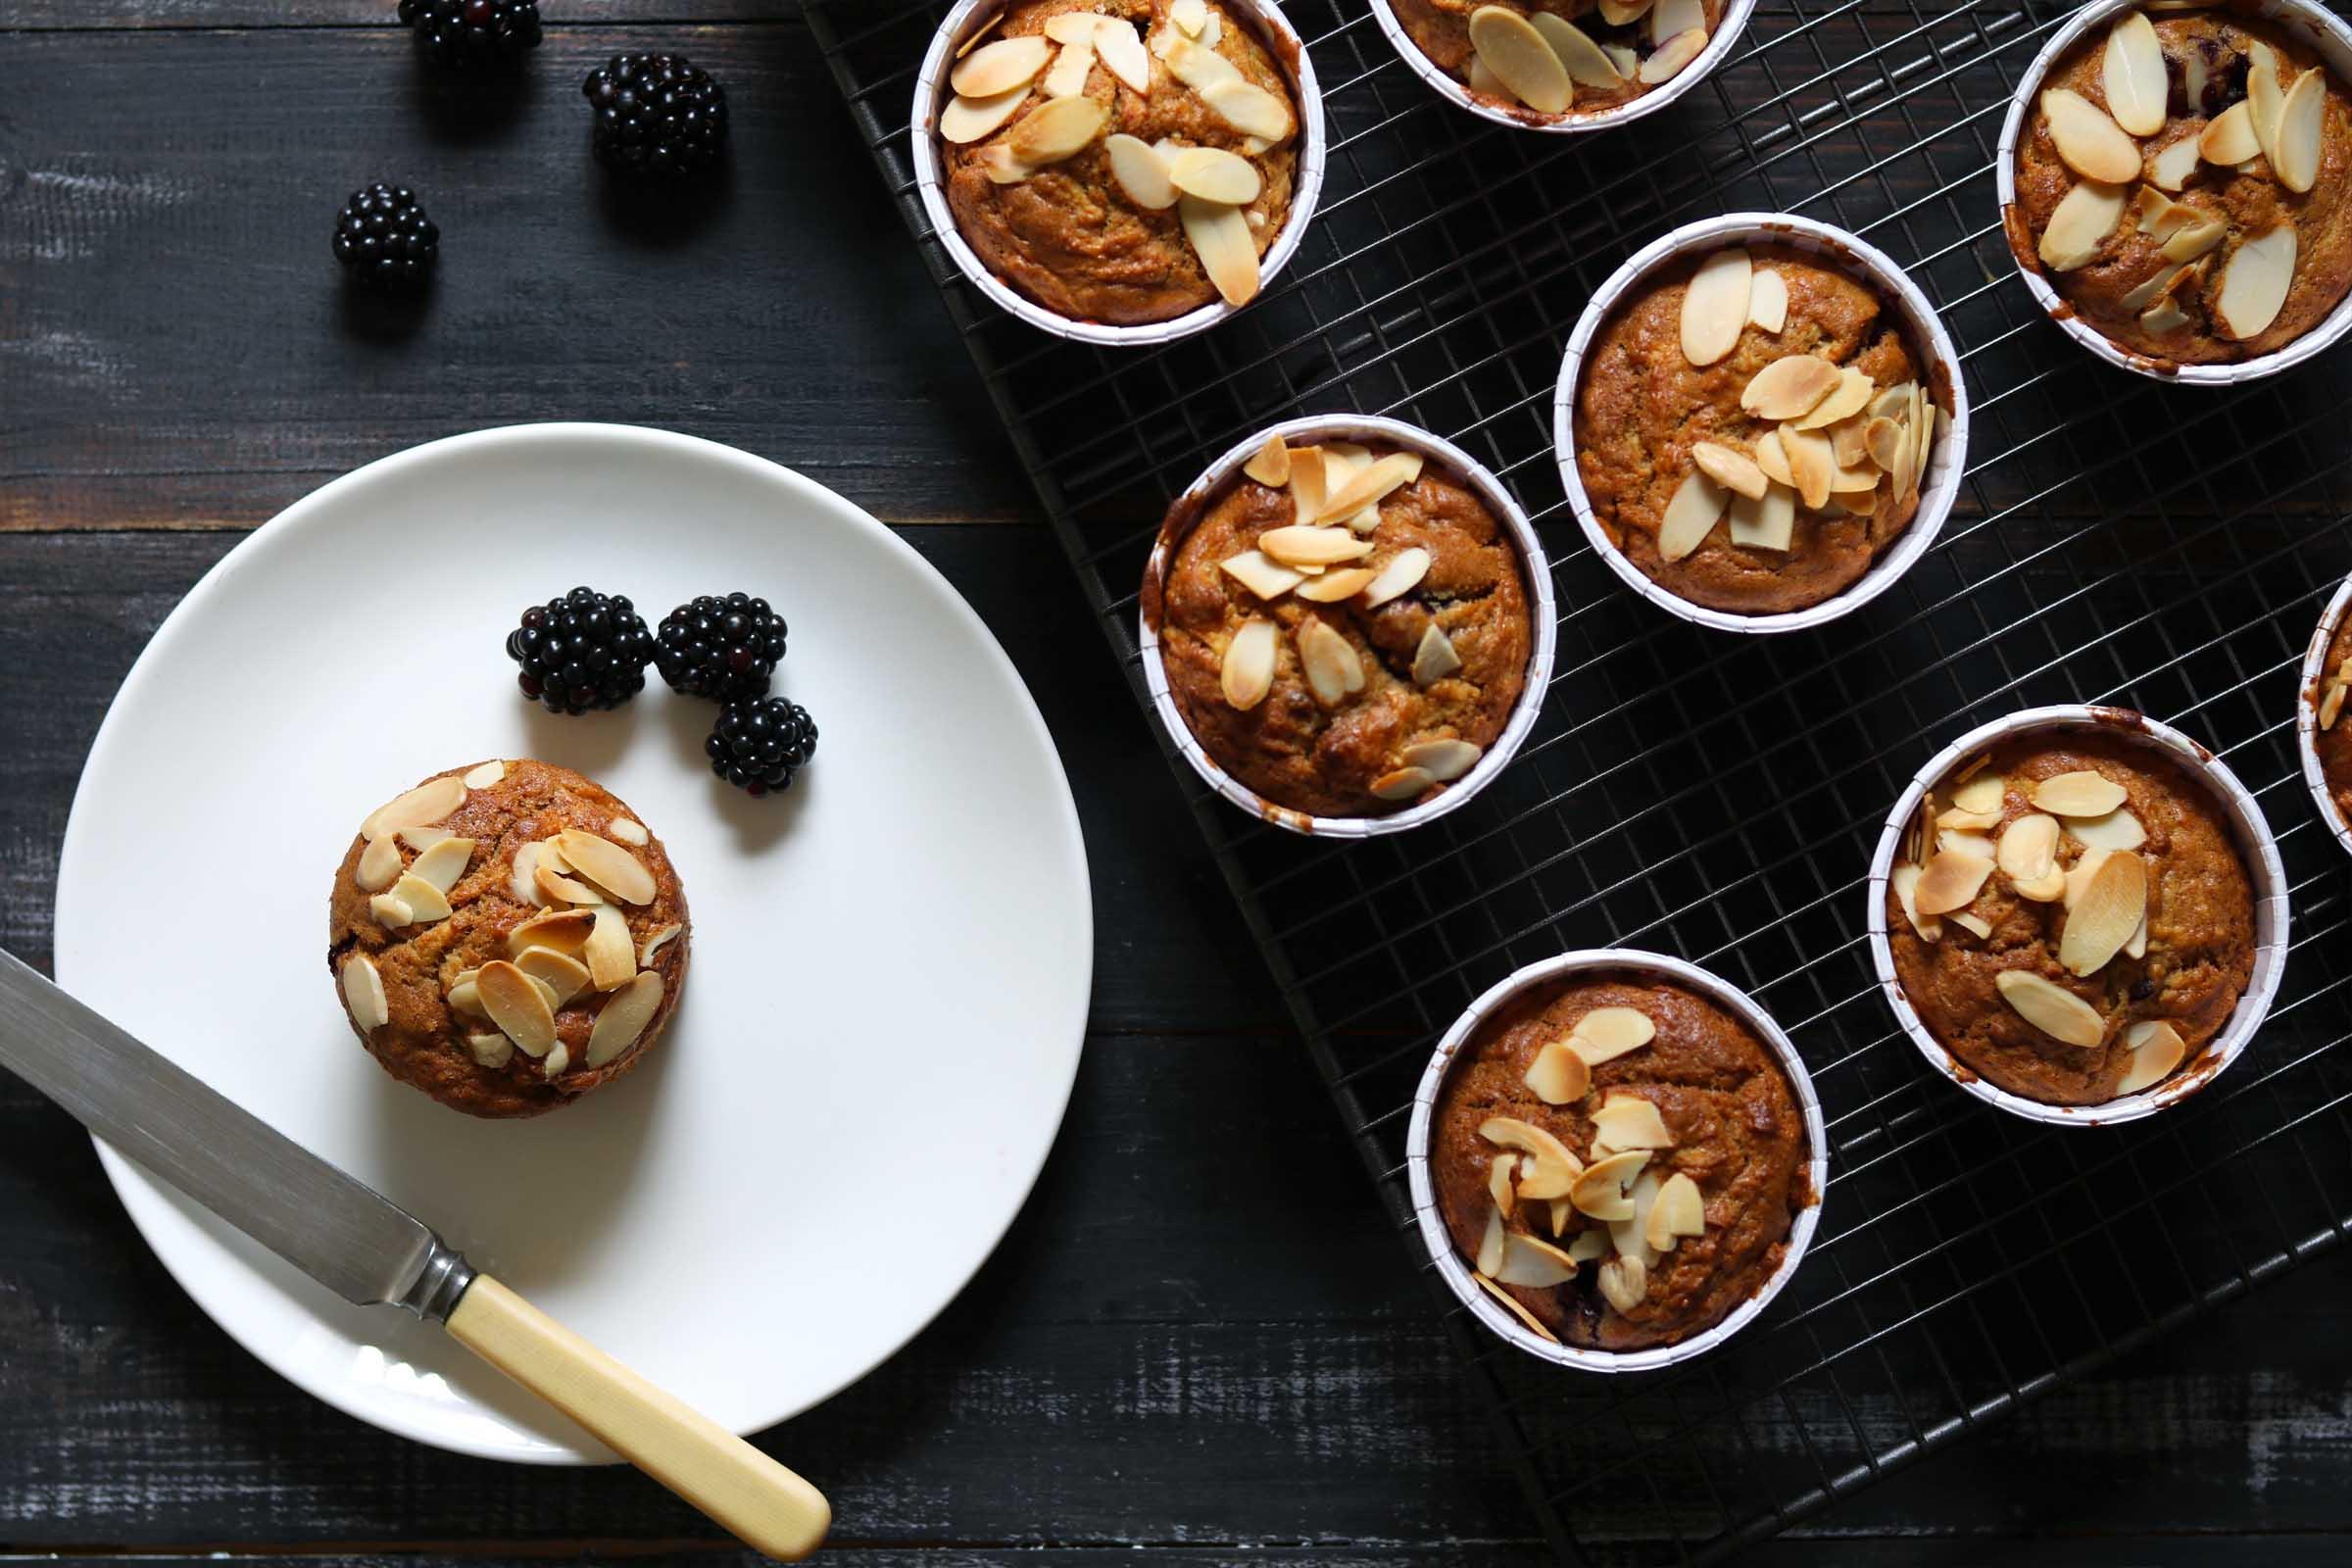 Apple & Blackberry Muffins - The Last Food Blog